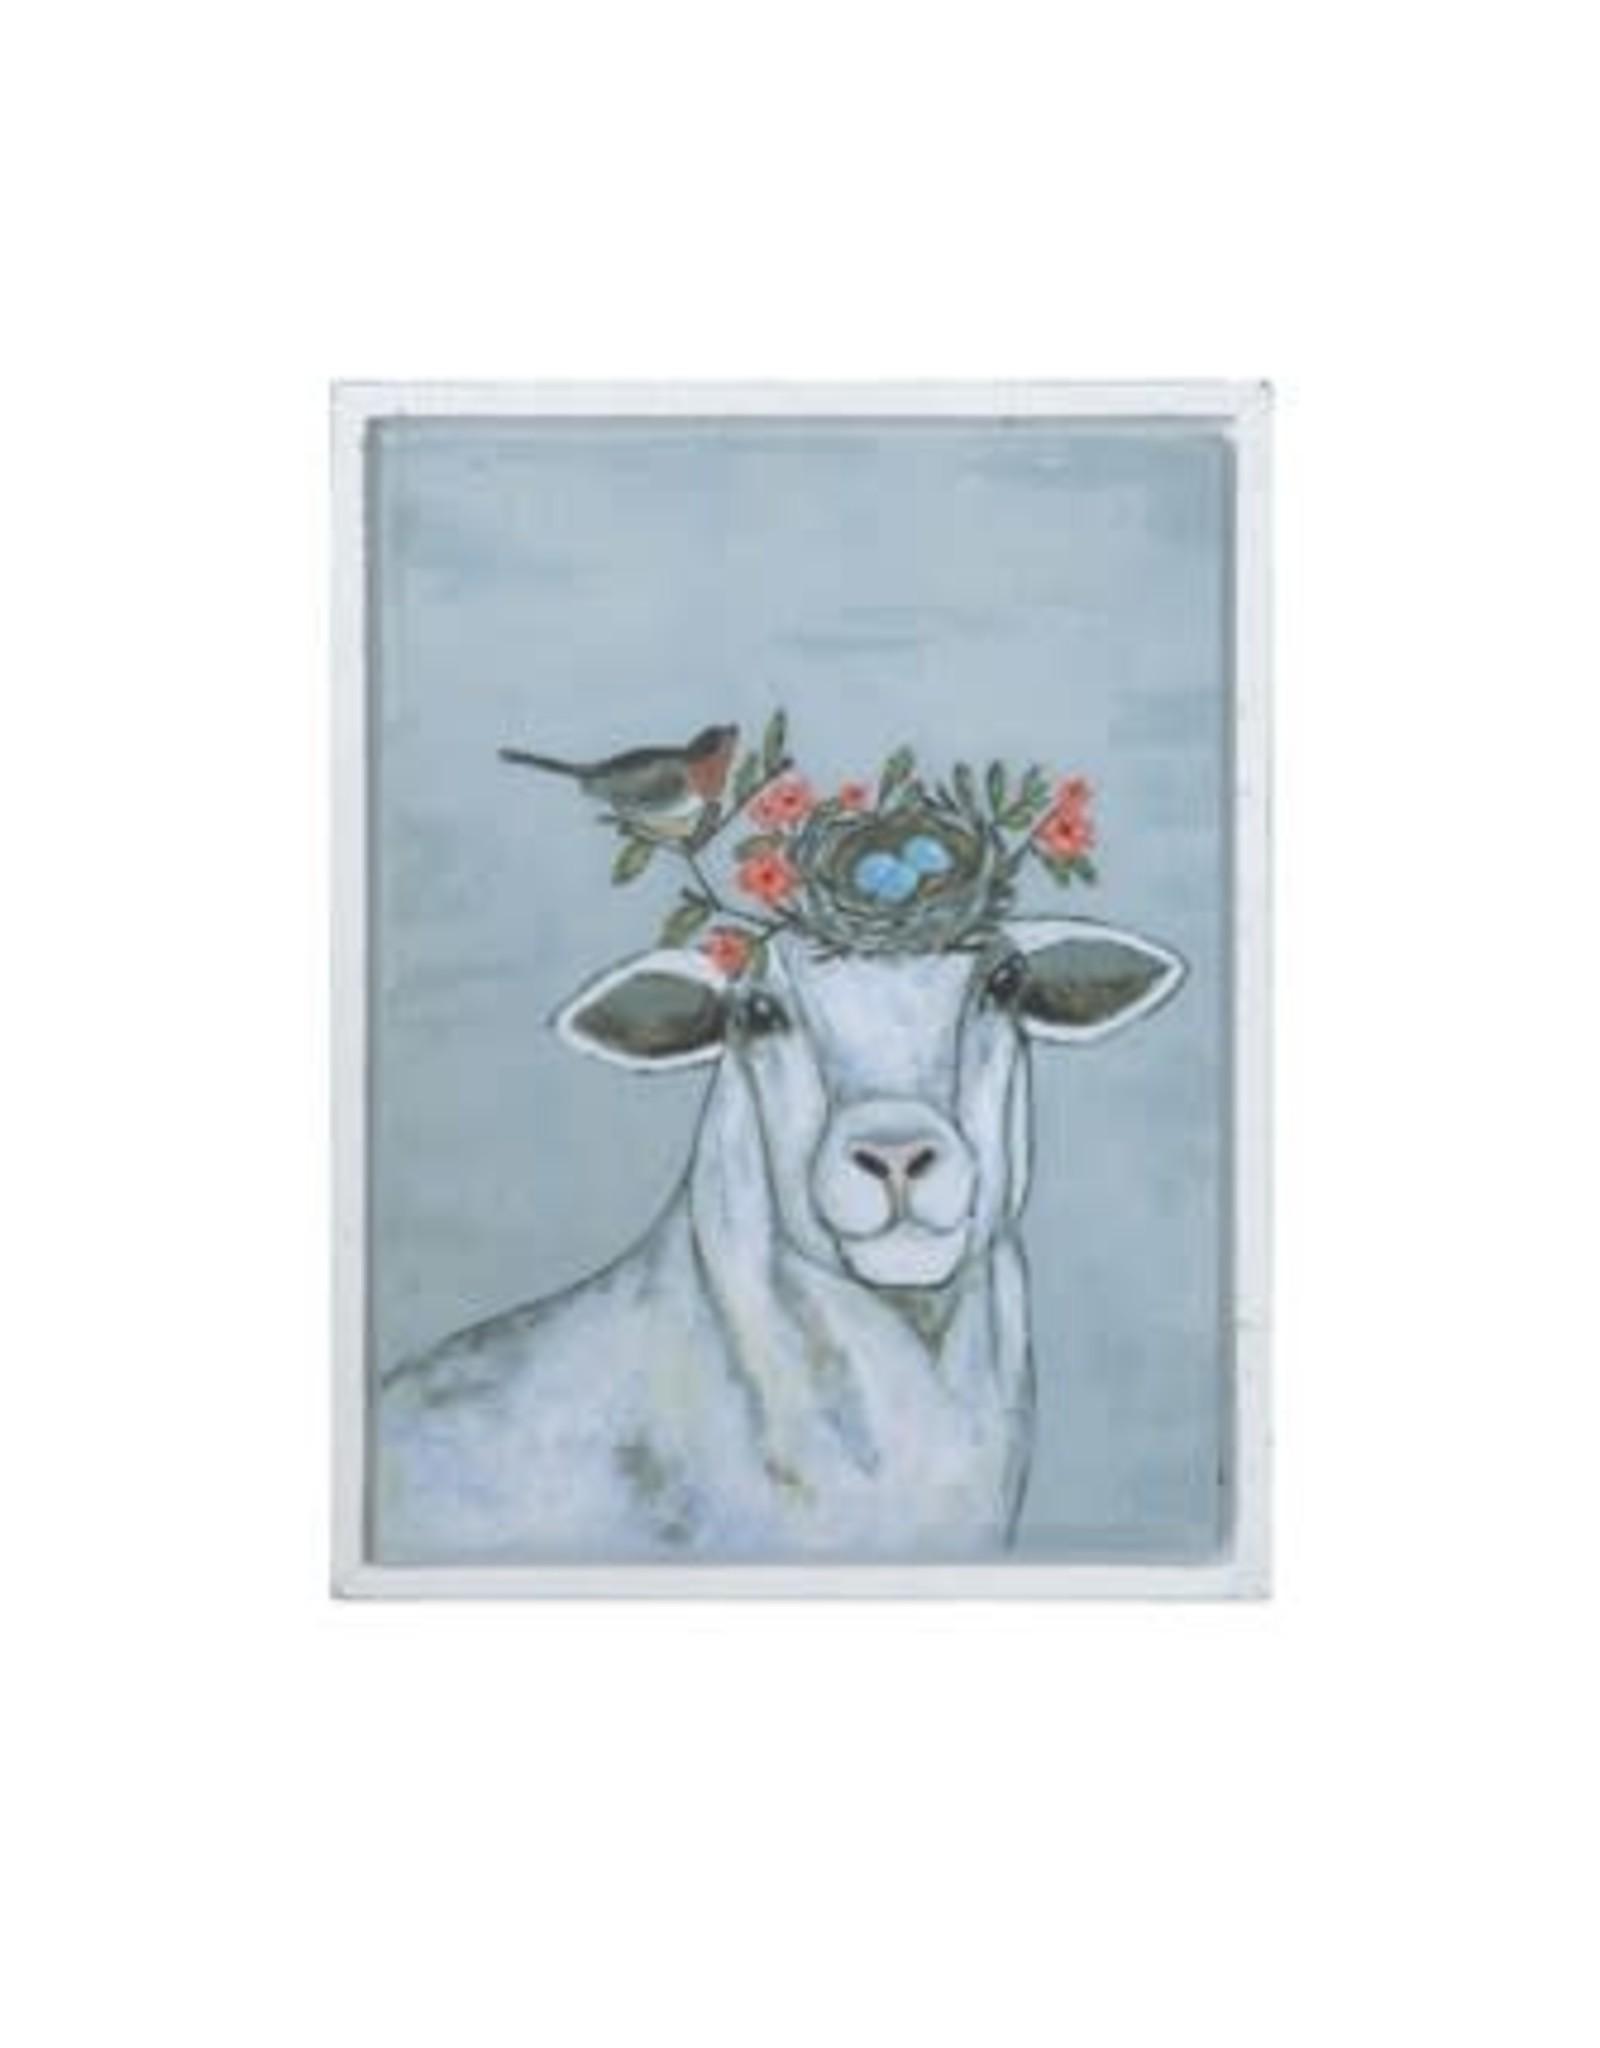 Creative Coop SHEEP AND BIRD WALL ART